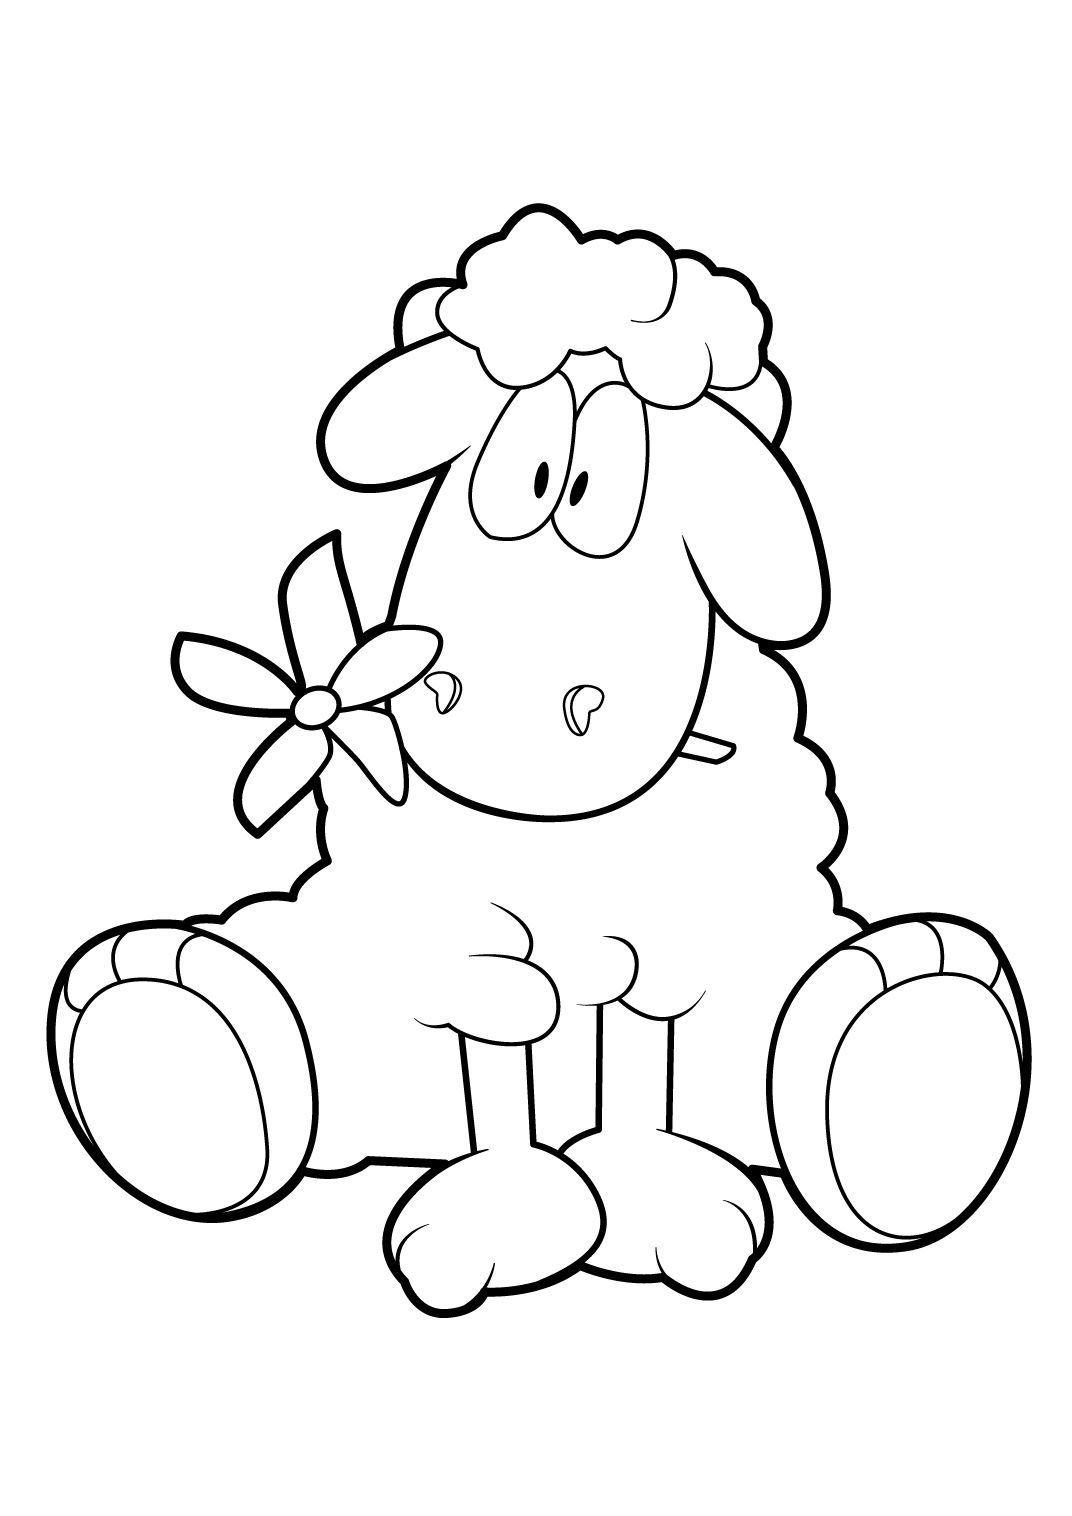 Coloriage Mouton 18 Coloriage Moutons Coloriages Animaux